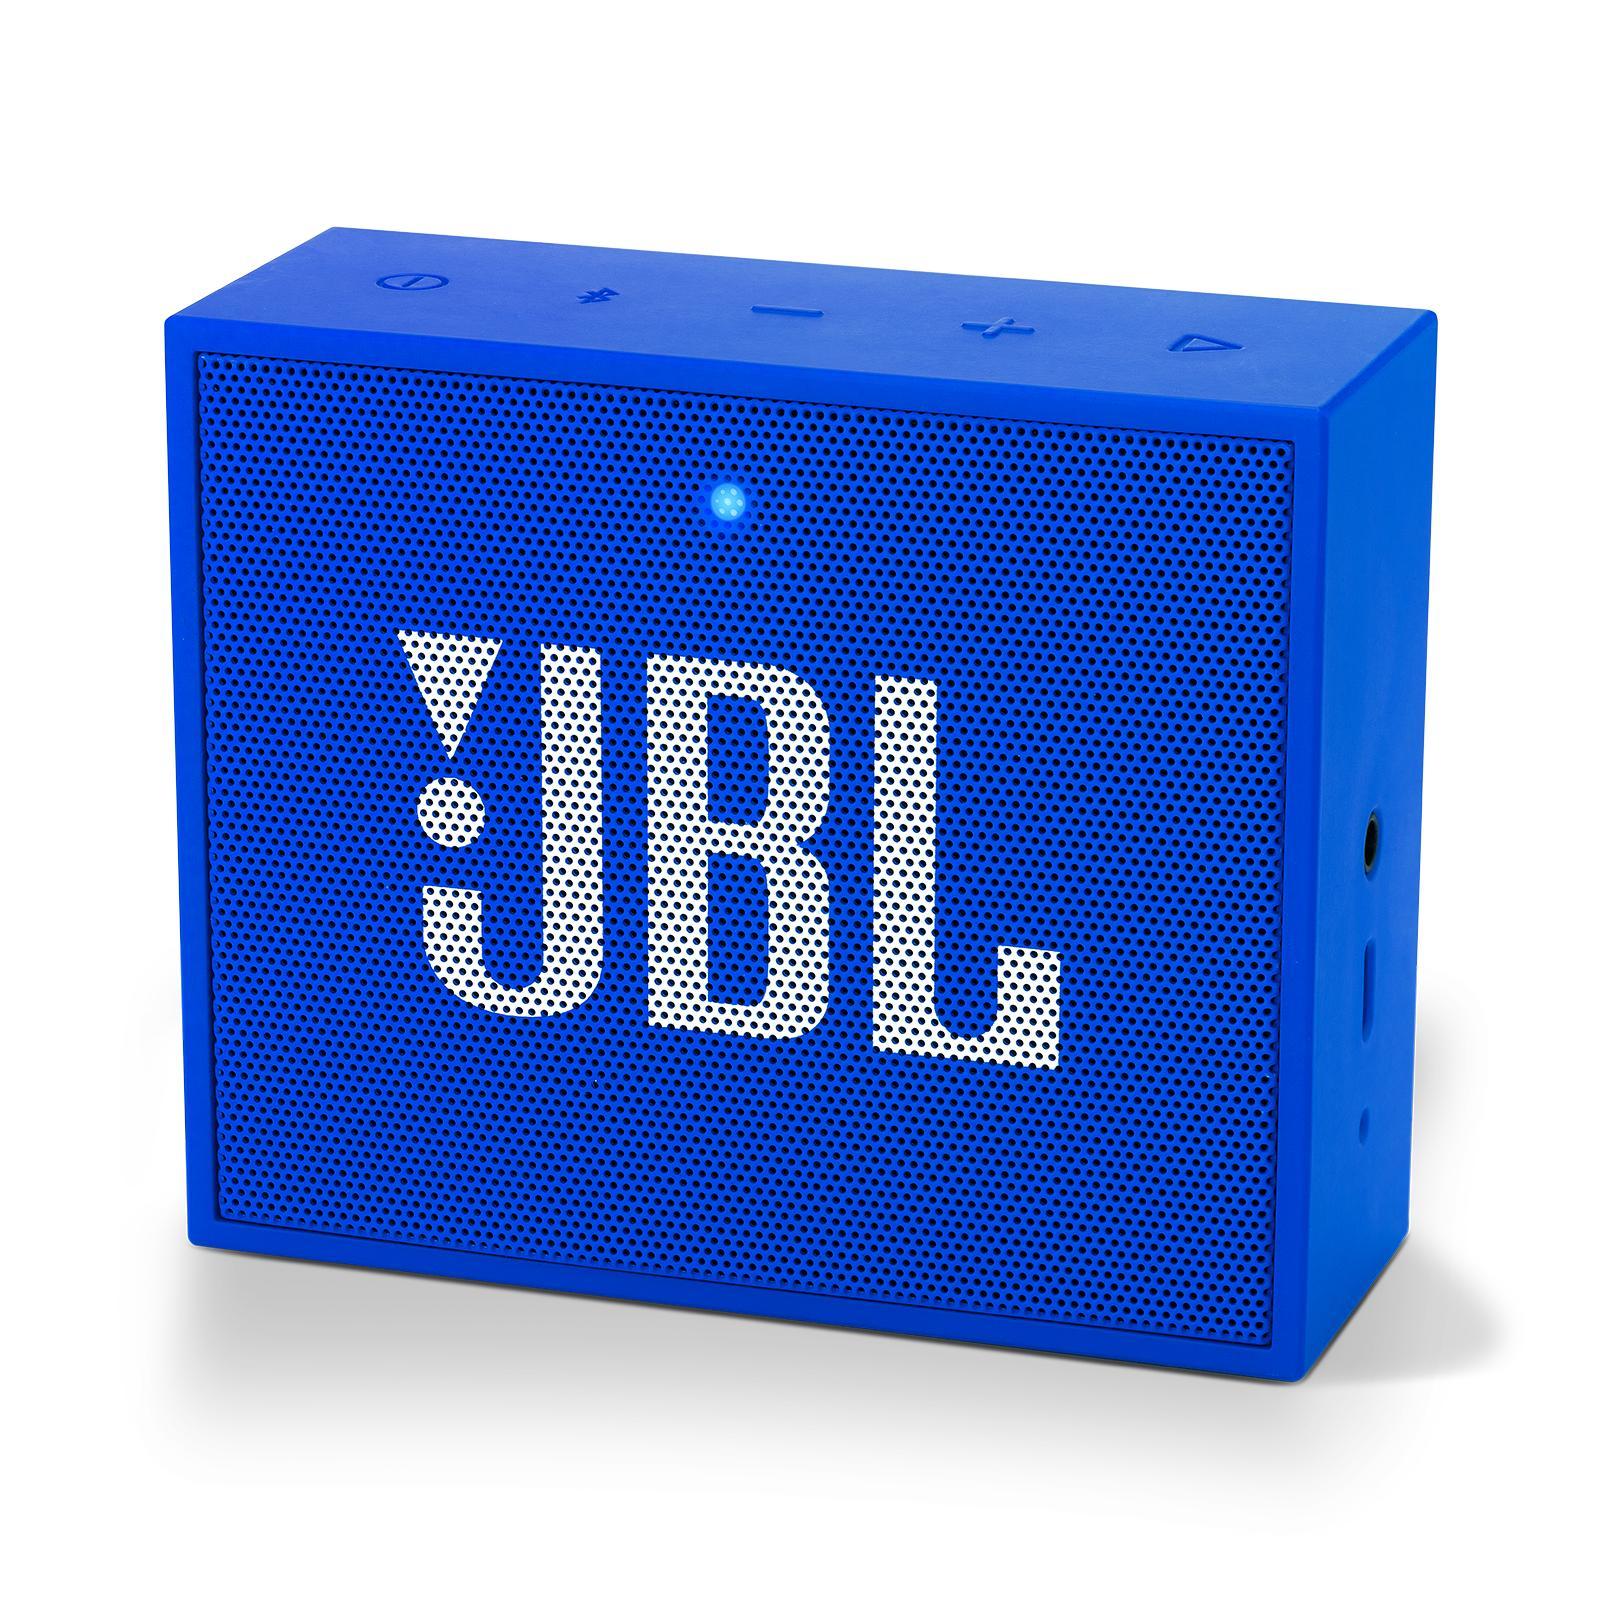 Kelebihan Jbl Extreme Portable Speaker Blue Terkini Daftar Harga Bluetooth Xtreme Hitam Go Plus